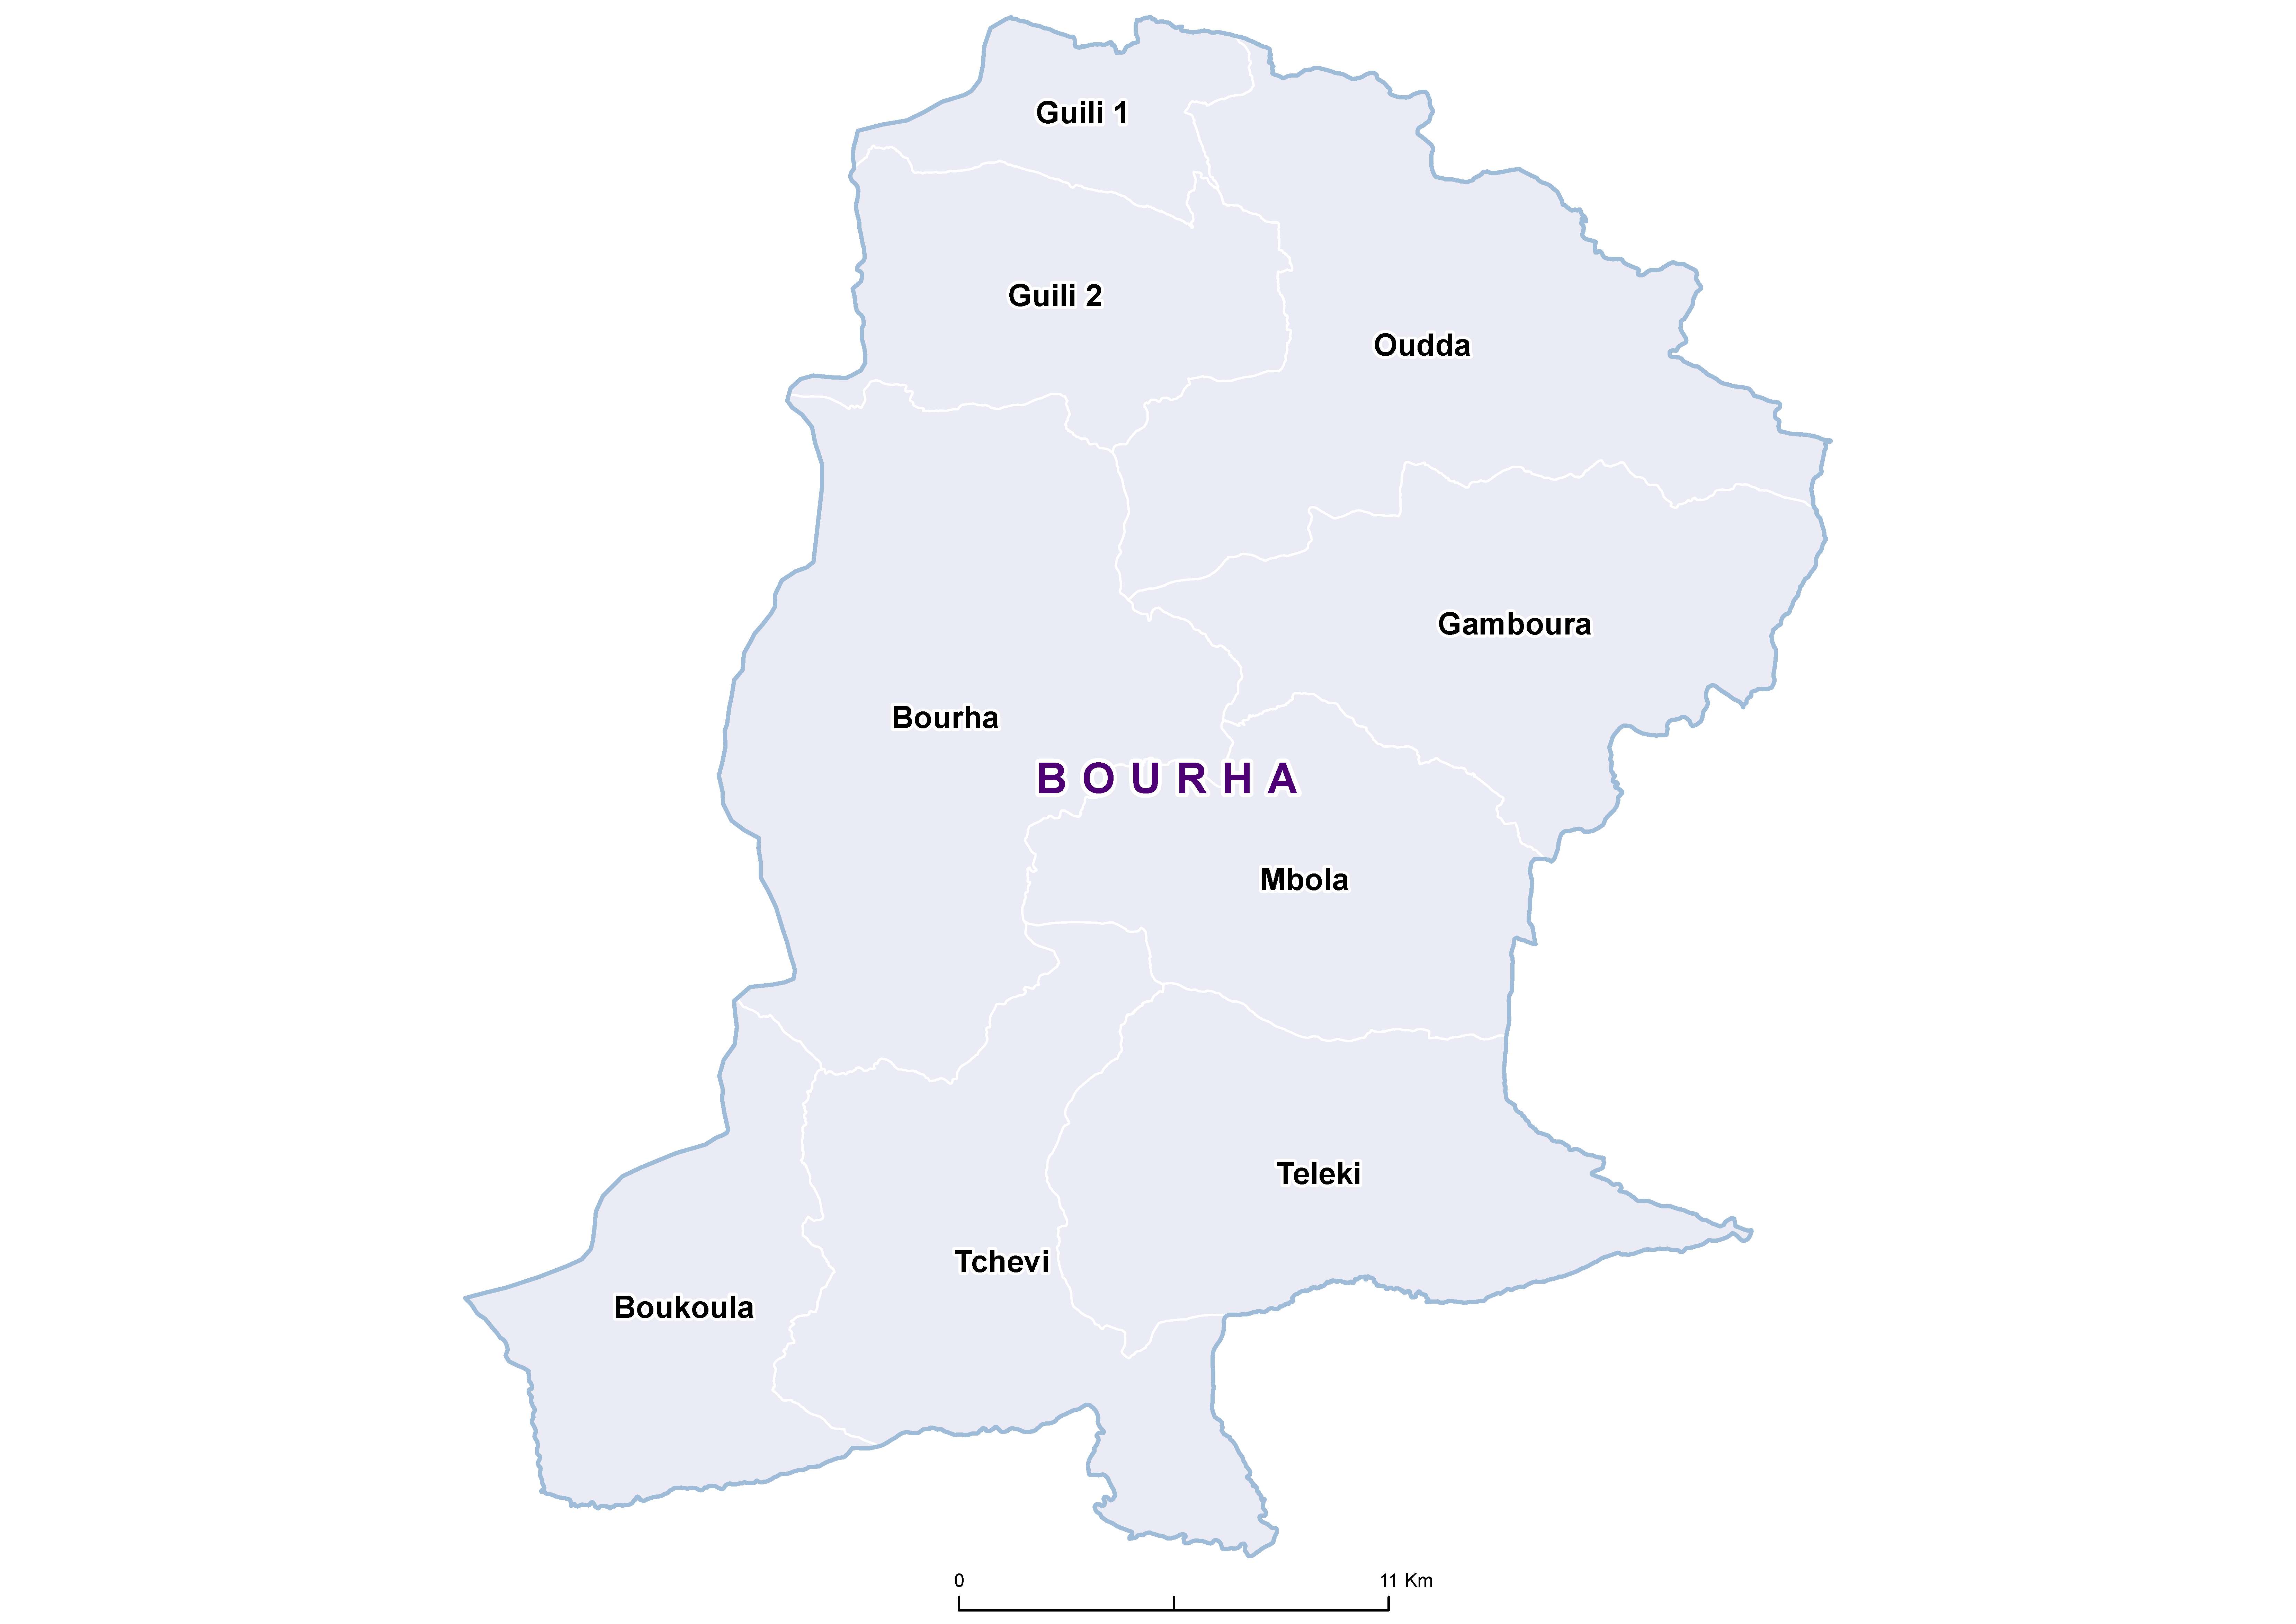 Bourha STH 20180001